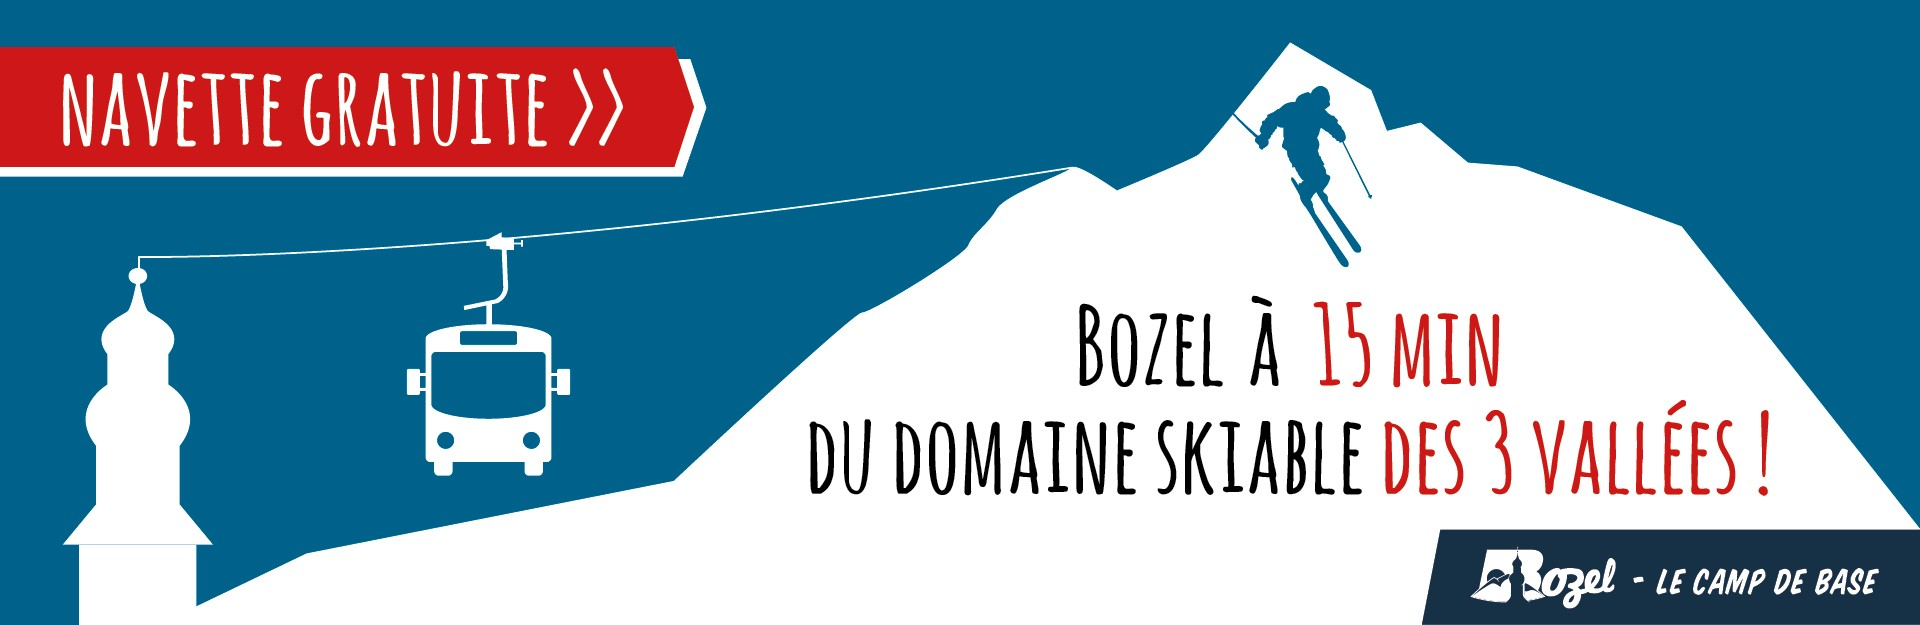 Navette gratuite Bozel Courchevel